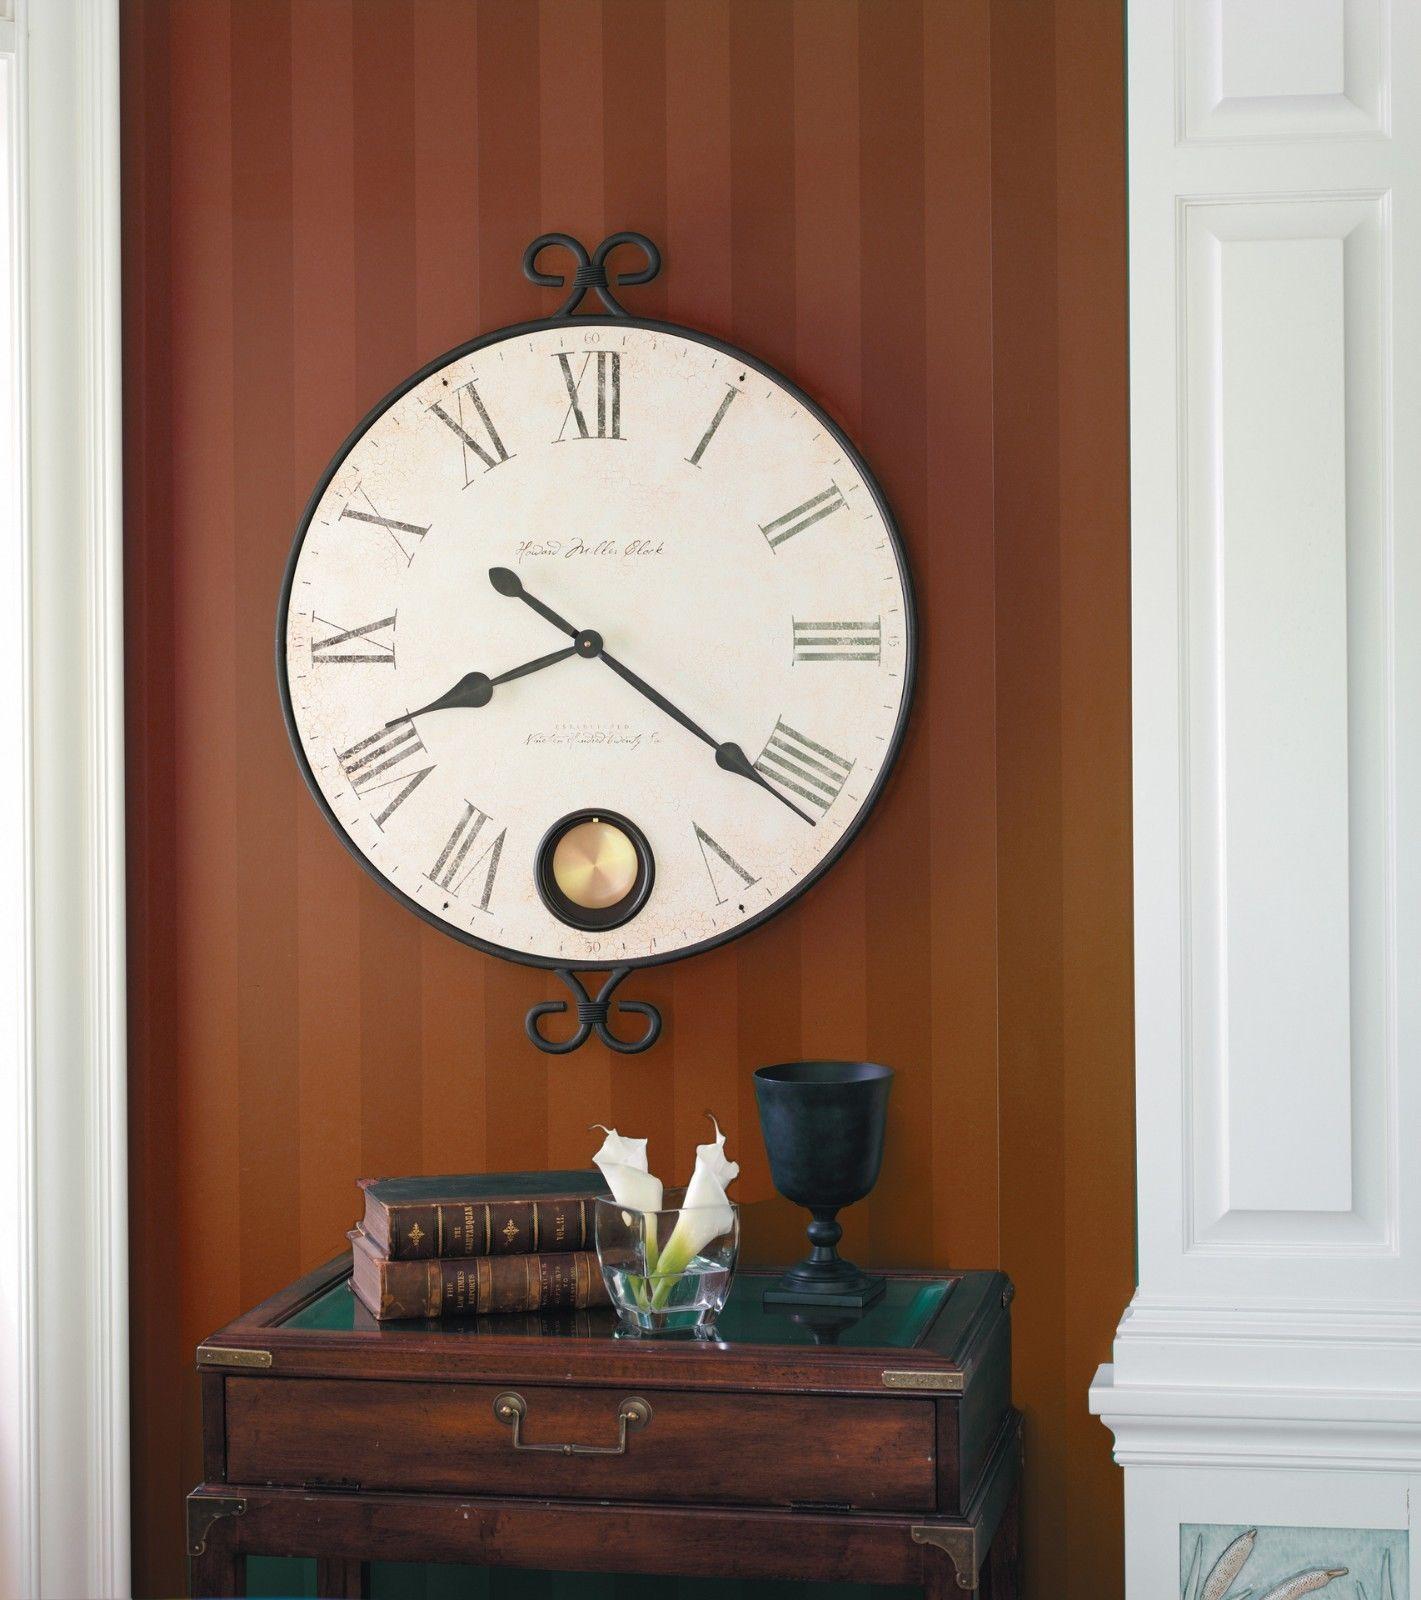 JENKINS-HOWARD MILLER TWO SIDED SOFA TABLE MANTEL CLOCK 635-155